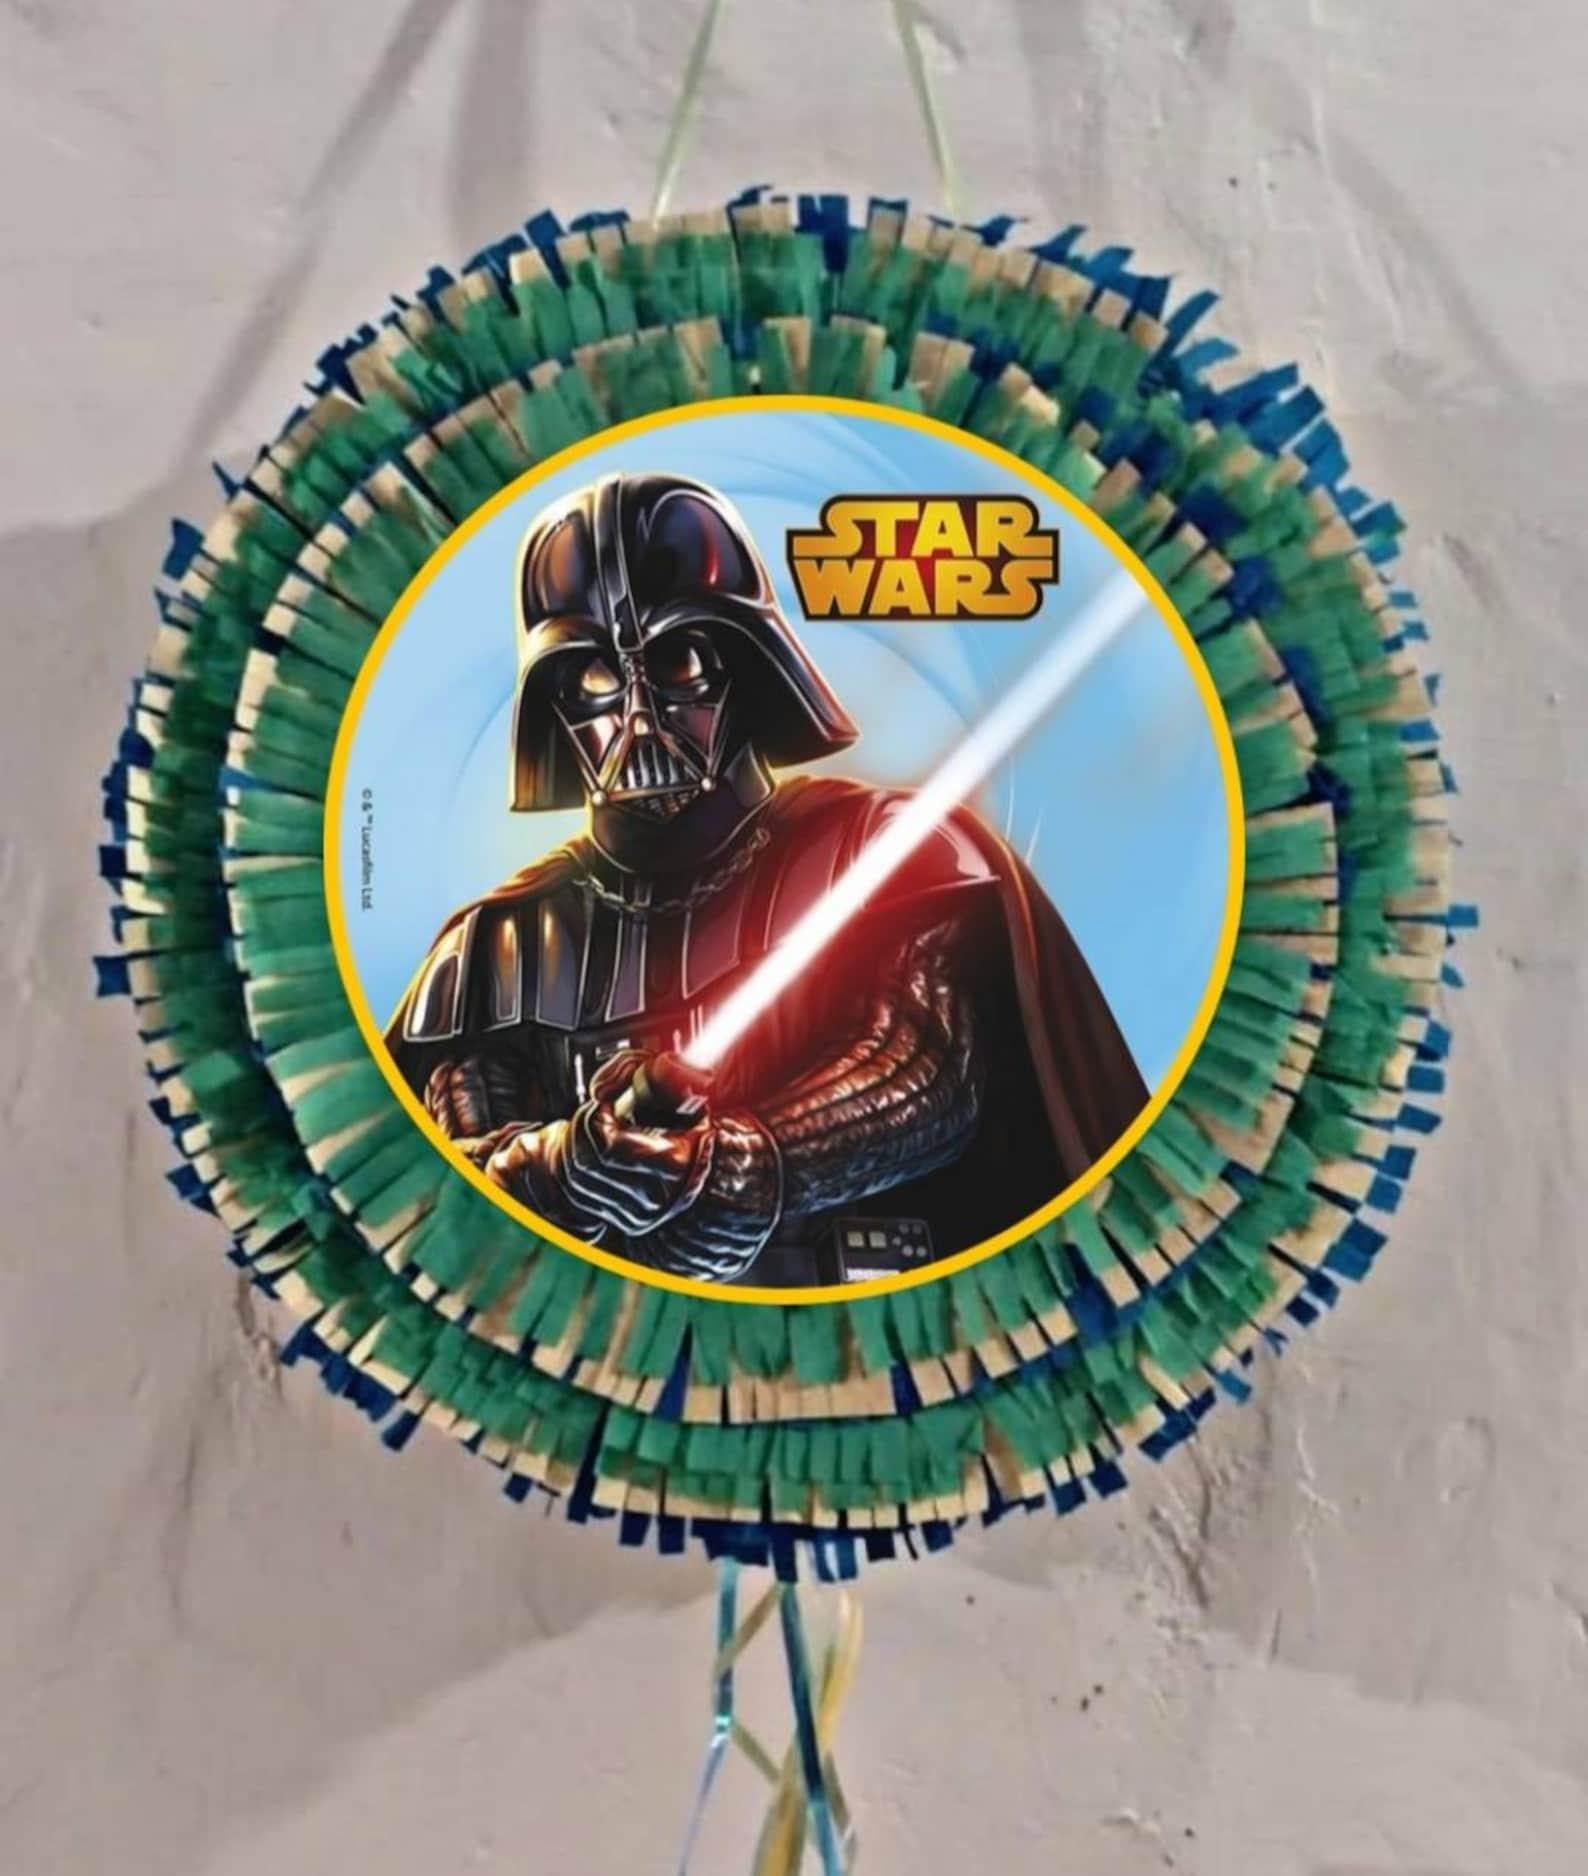 Darth Vader classic pinata style